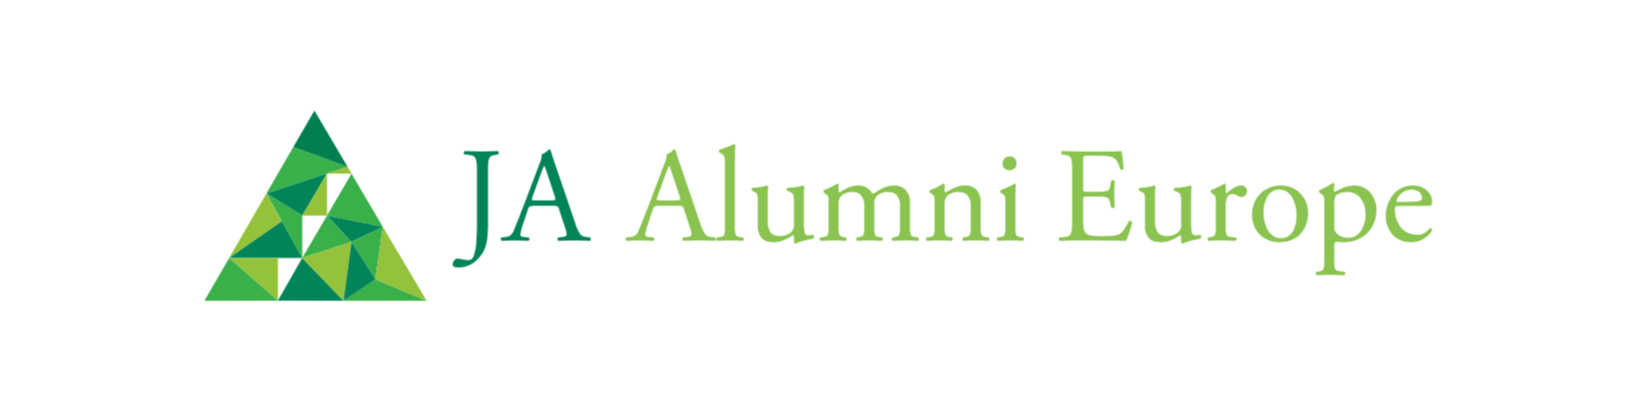 Corporate Identity — JA Alumni Europe